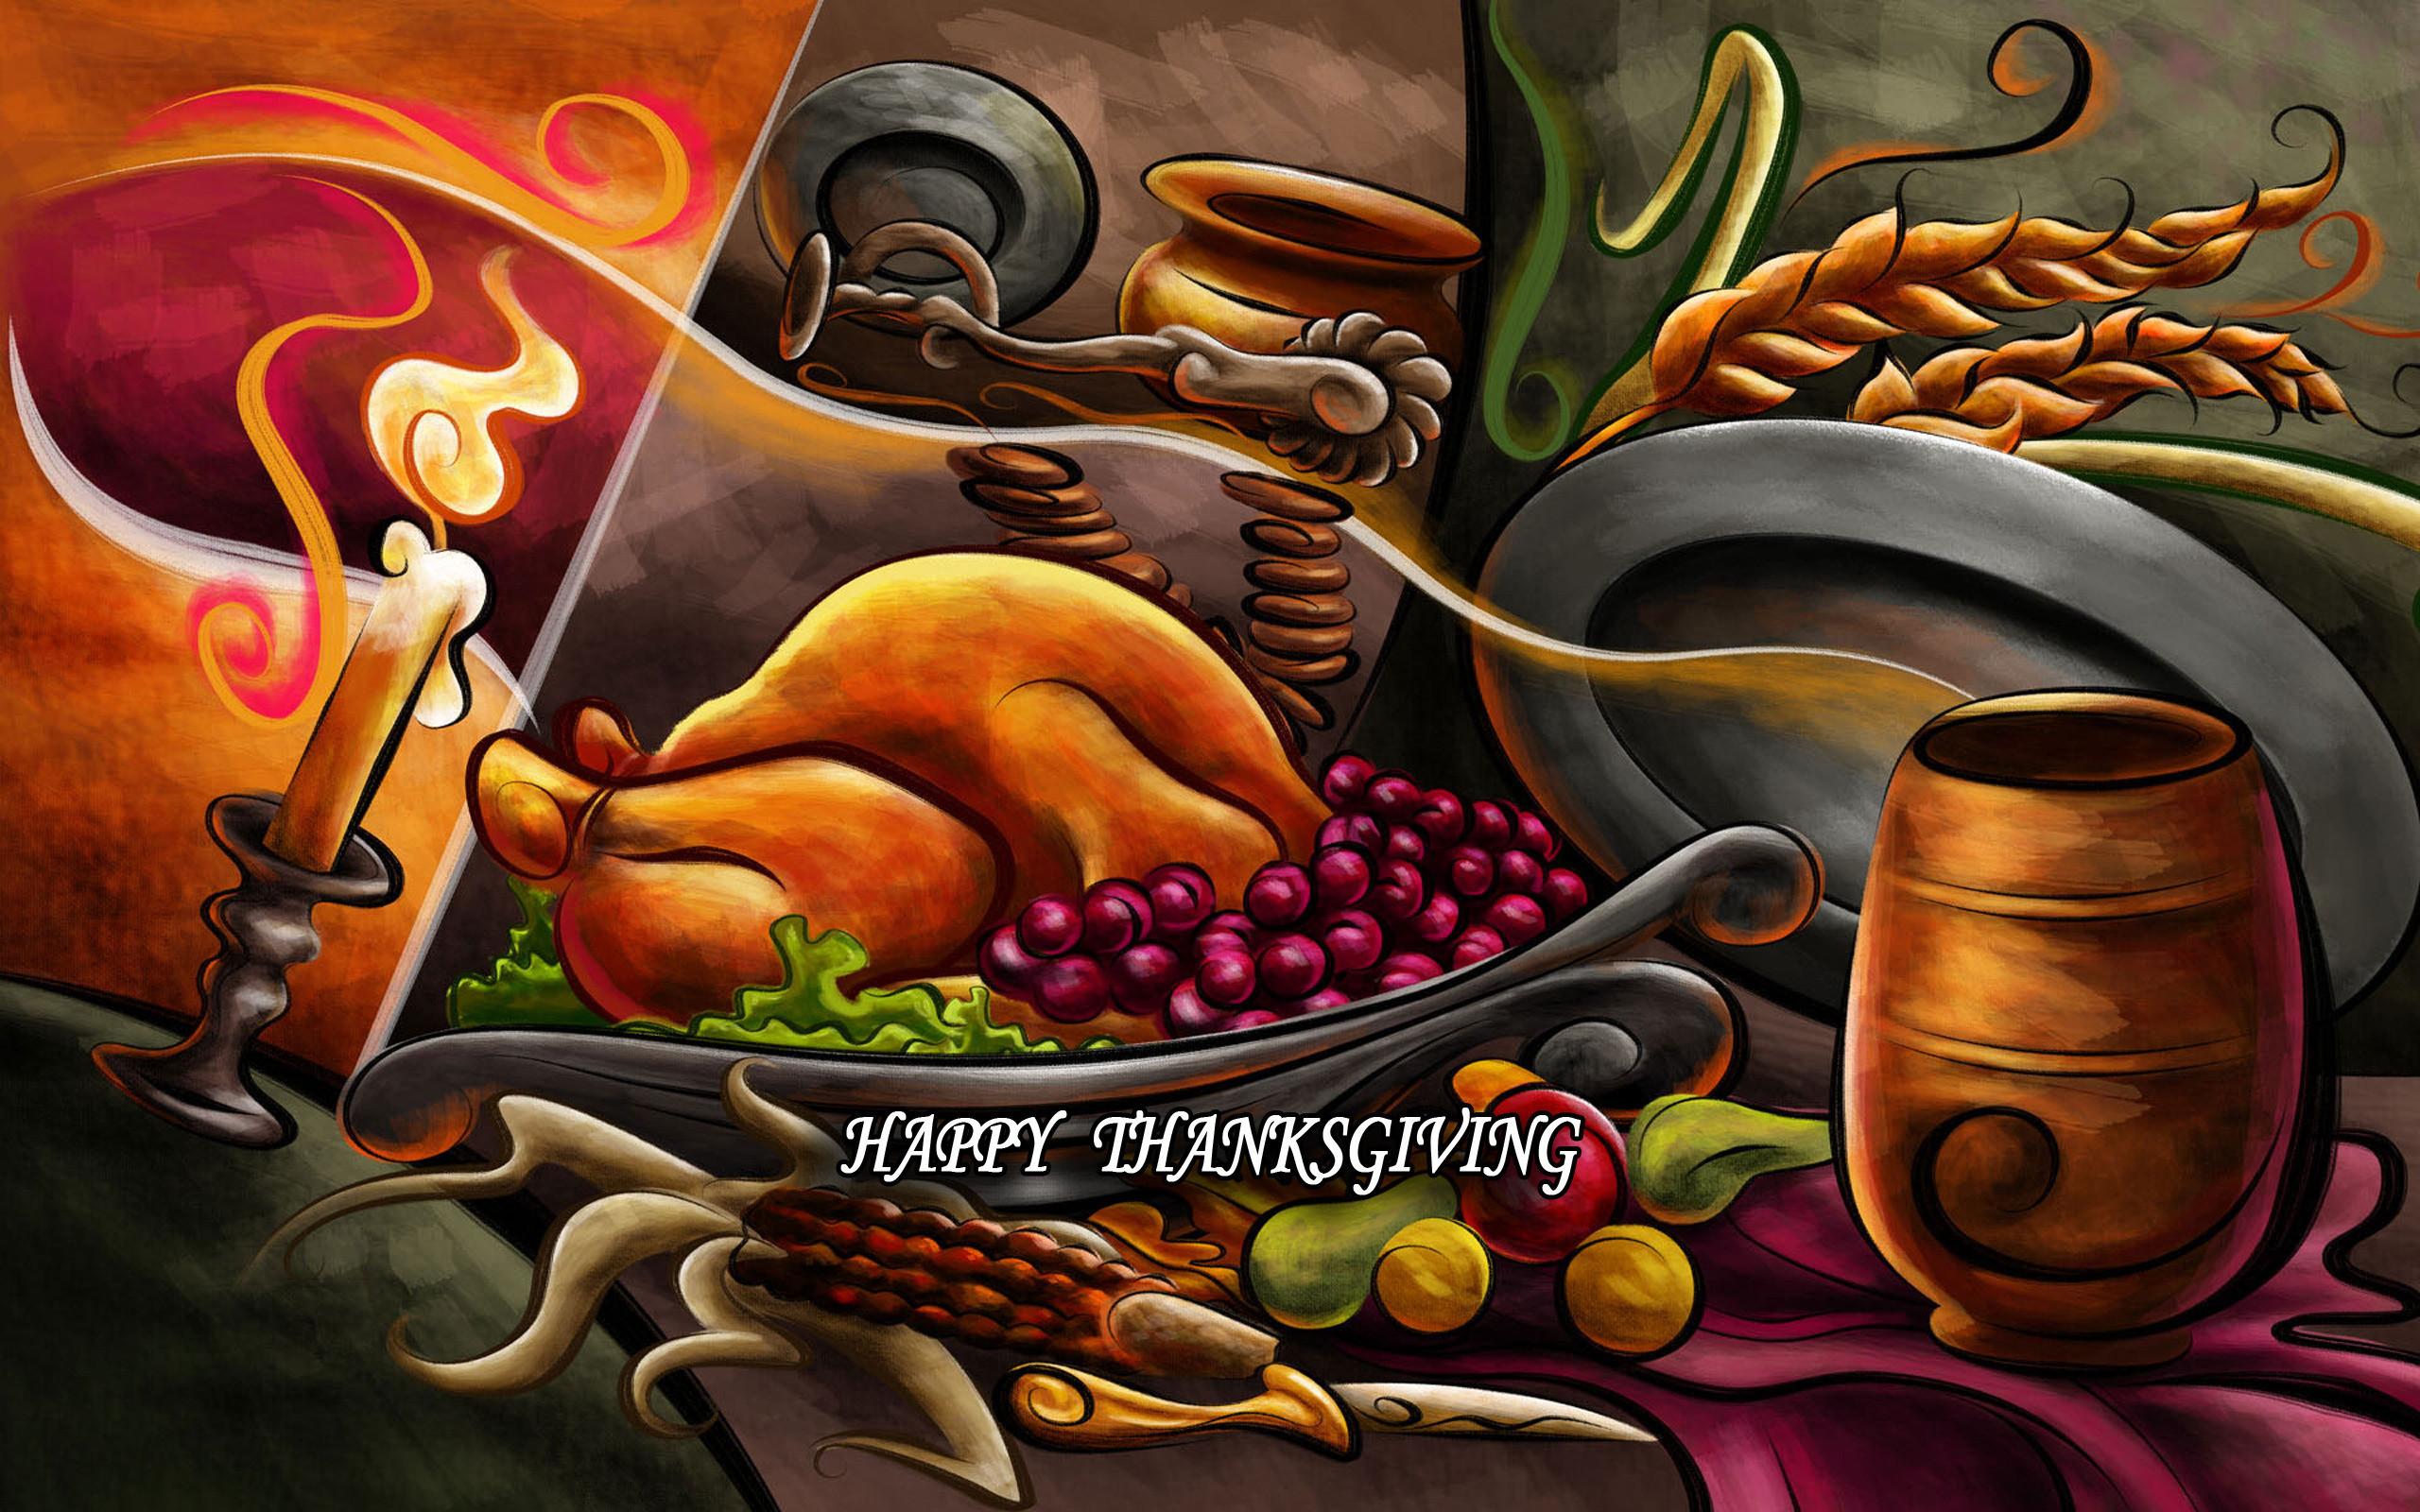 Thanksgiving Dinner Desktop Wallpaper.